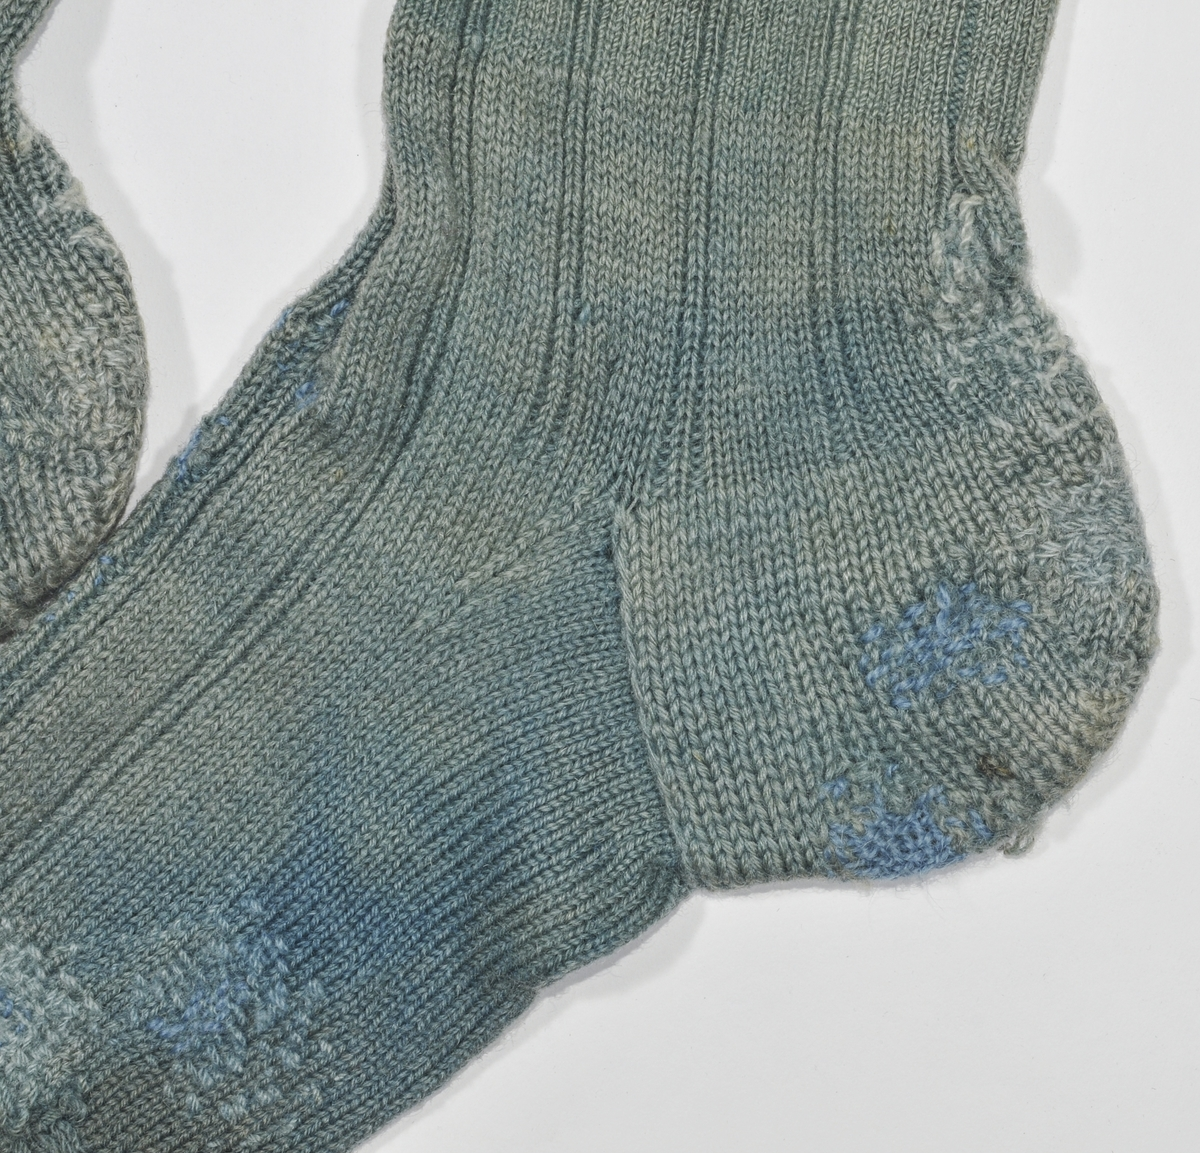 Strømpe, lang heimestrikka strømpe i blågrønt ullgarn. Pedant til VFF 6431. Strikka 6 rette og to vrange . Stoppet  mange plassar i foten.